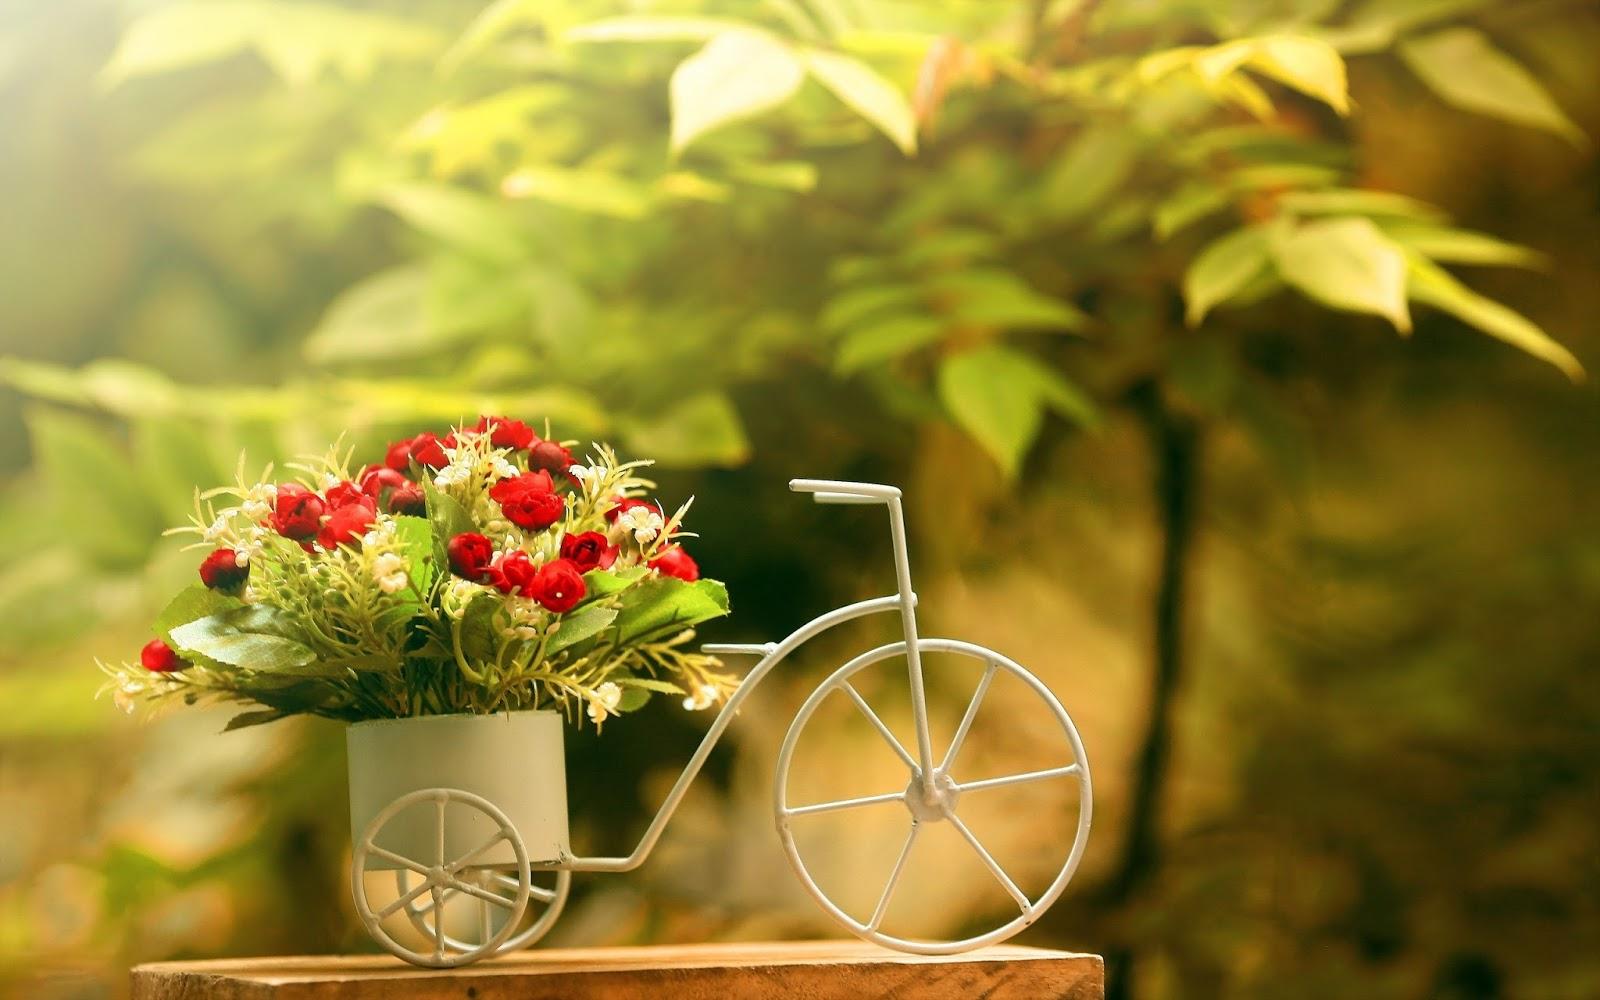 jannat's favourite photoshop tutorials: attractive floral wallpapers